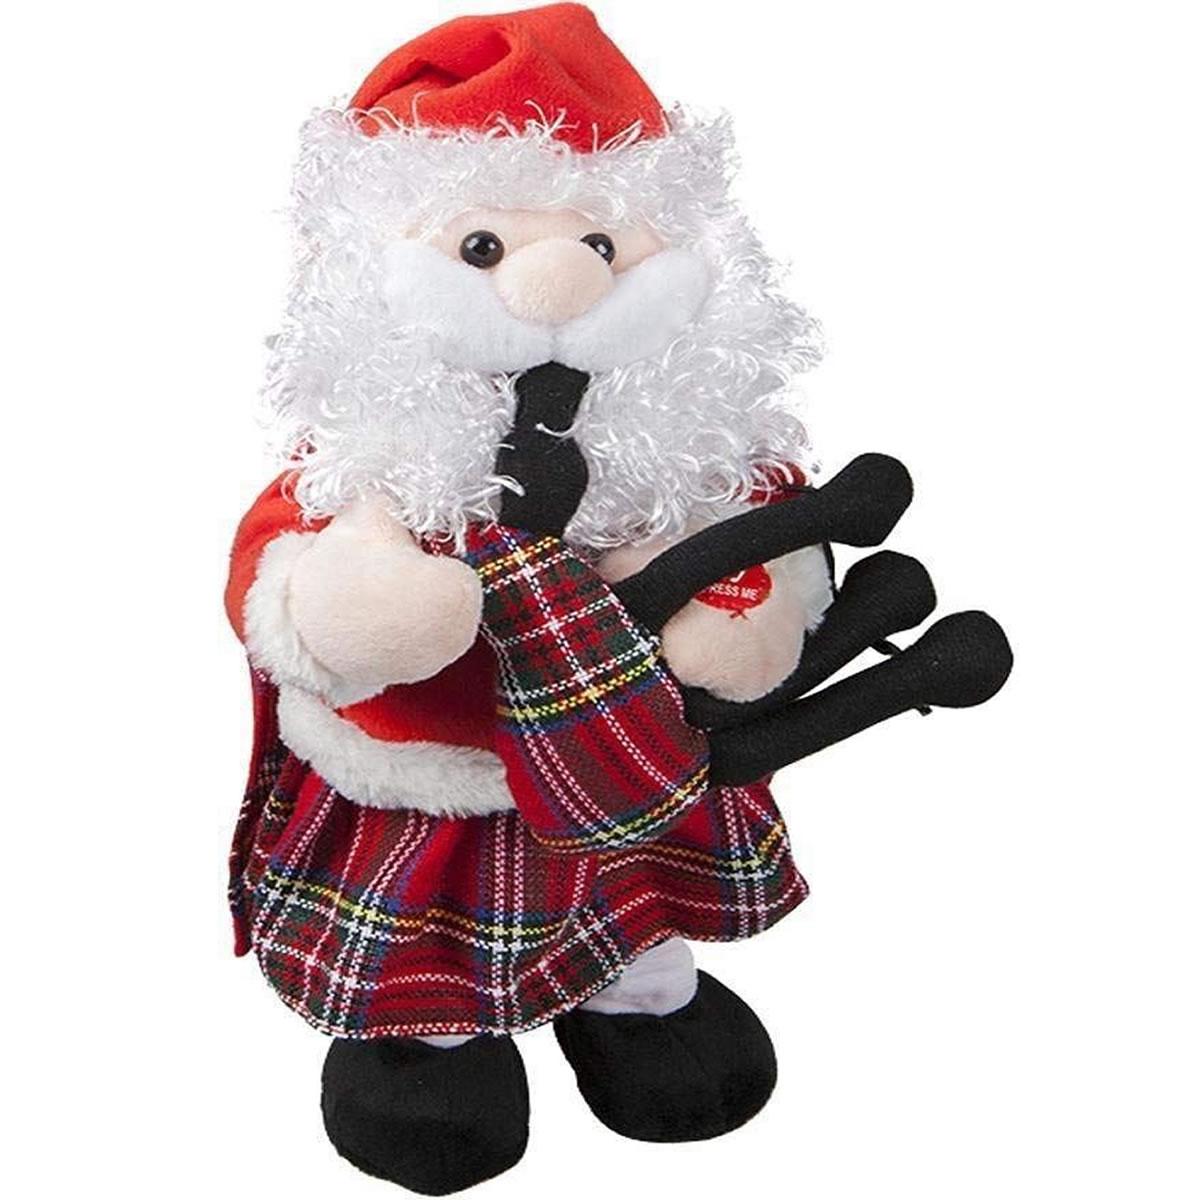 12 Musical Dancing Santa Bagpipe Scottish Festive Xmas Christmas Novelty Decor 5050565288202 Ebay